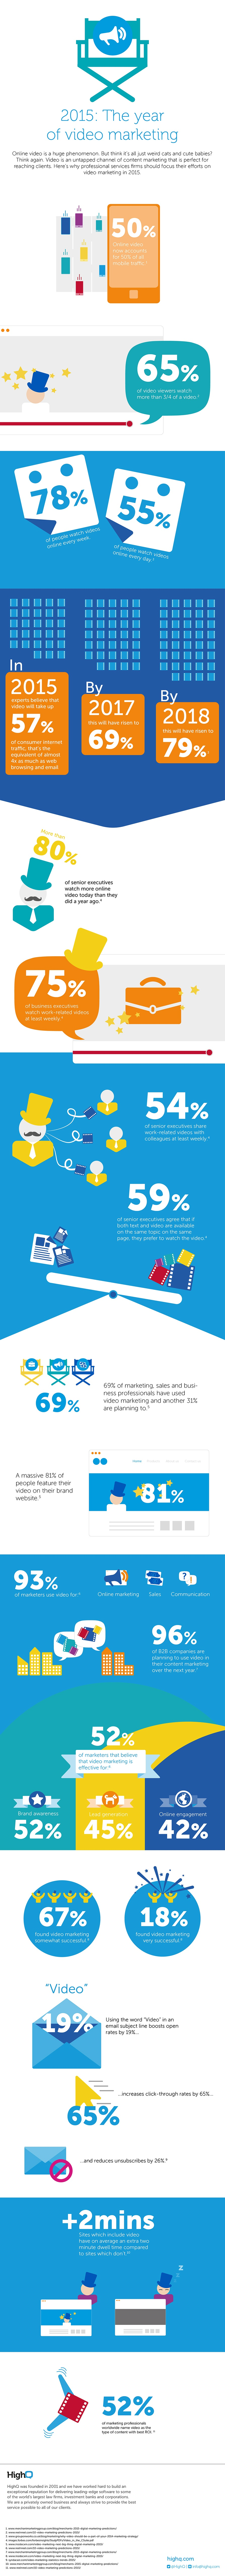 video-marketing-2016-infographic